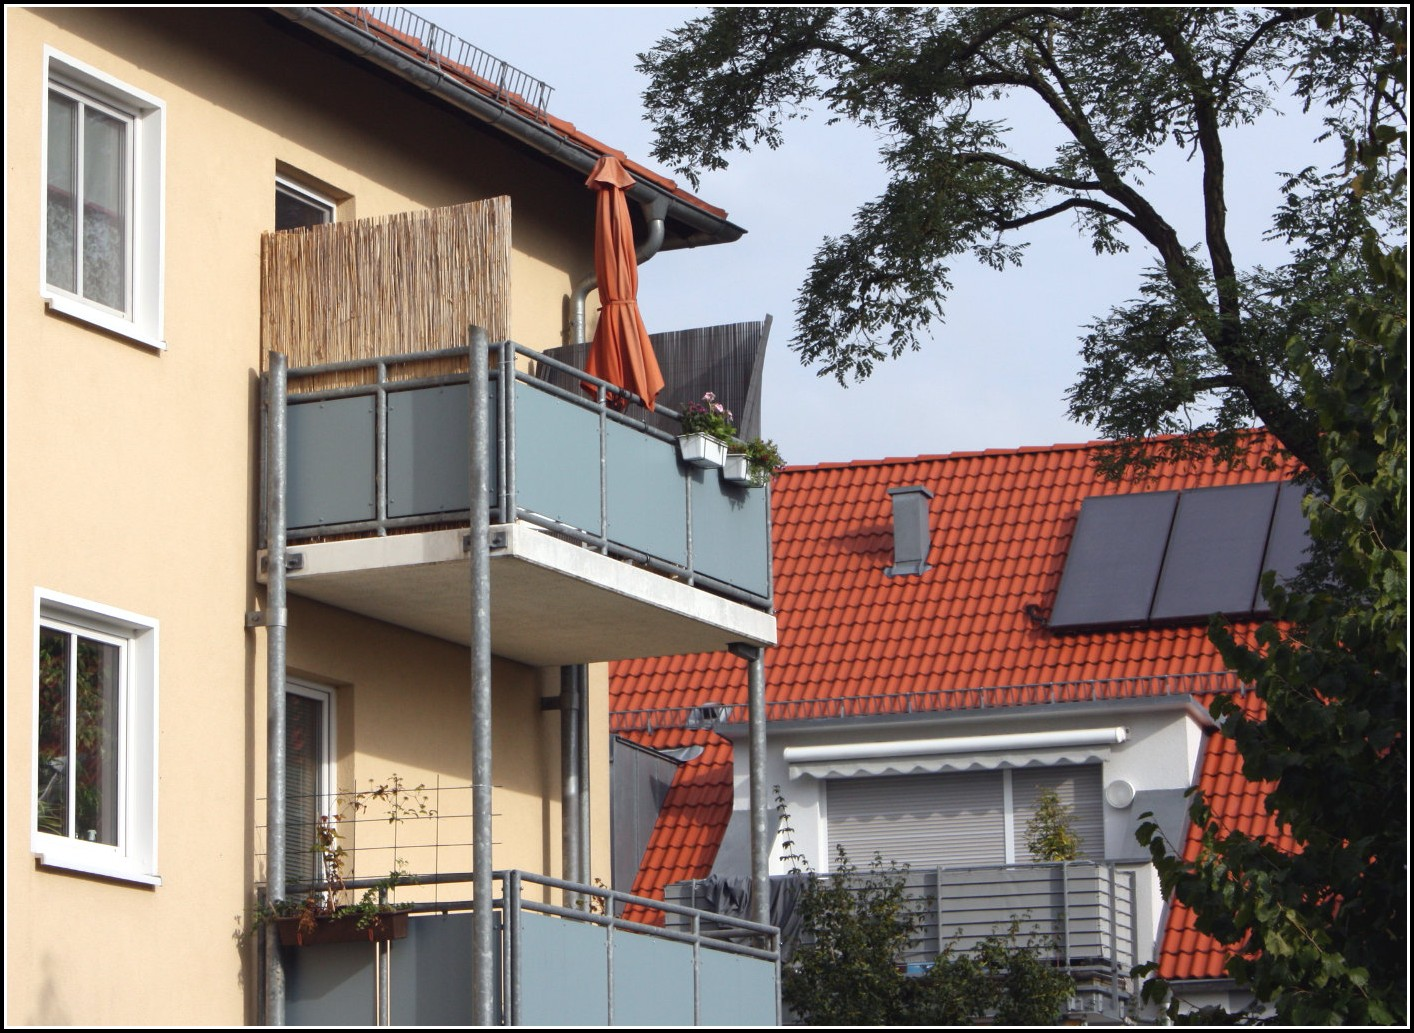 Balkon Sichtschutz Bambus Hornbach